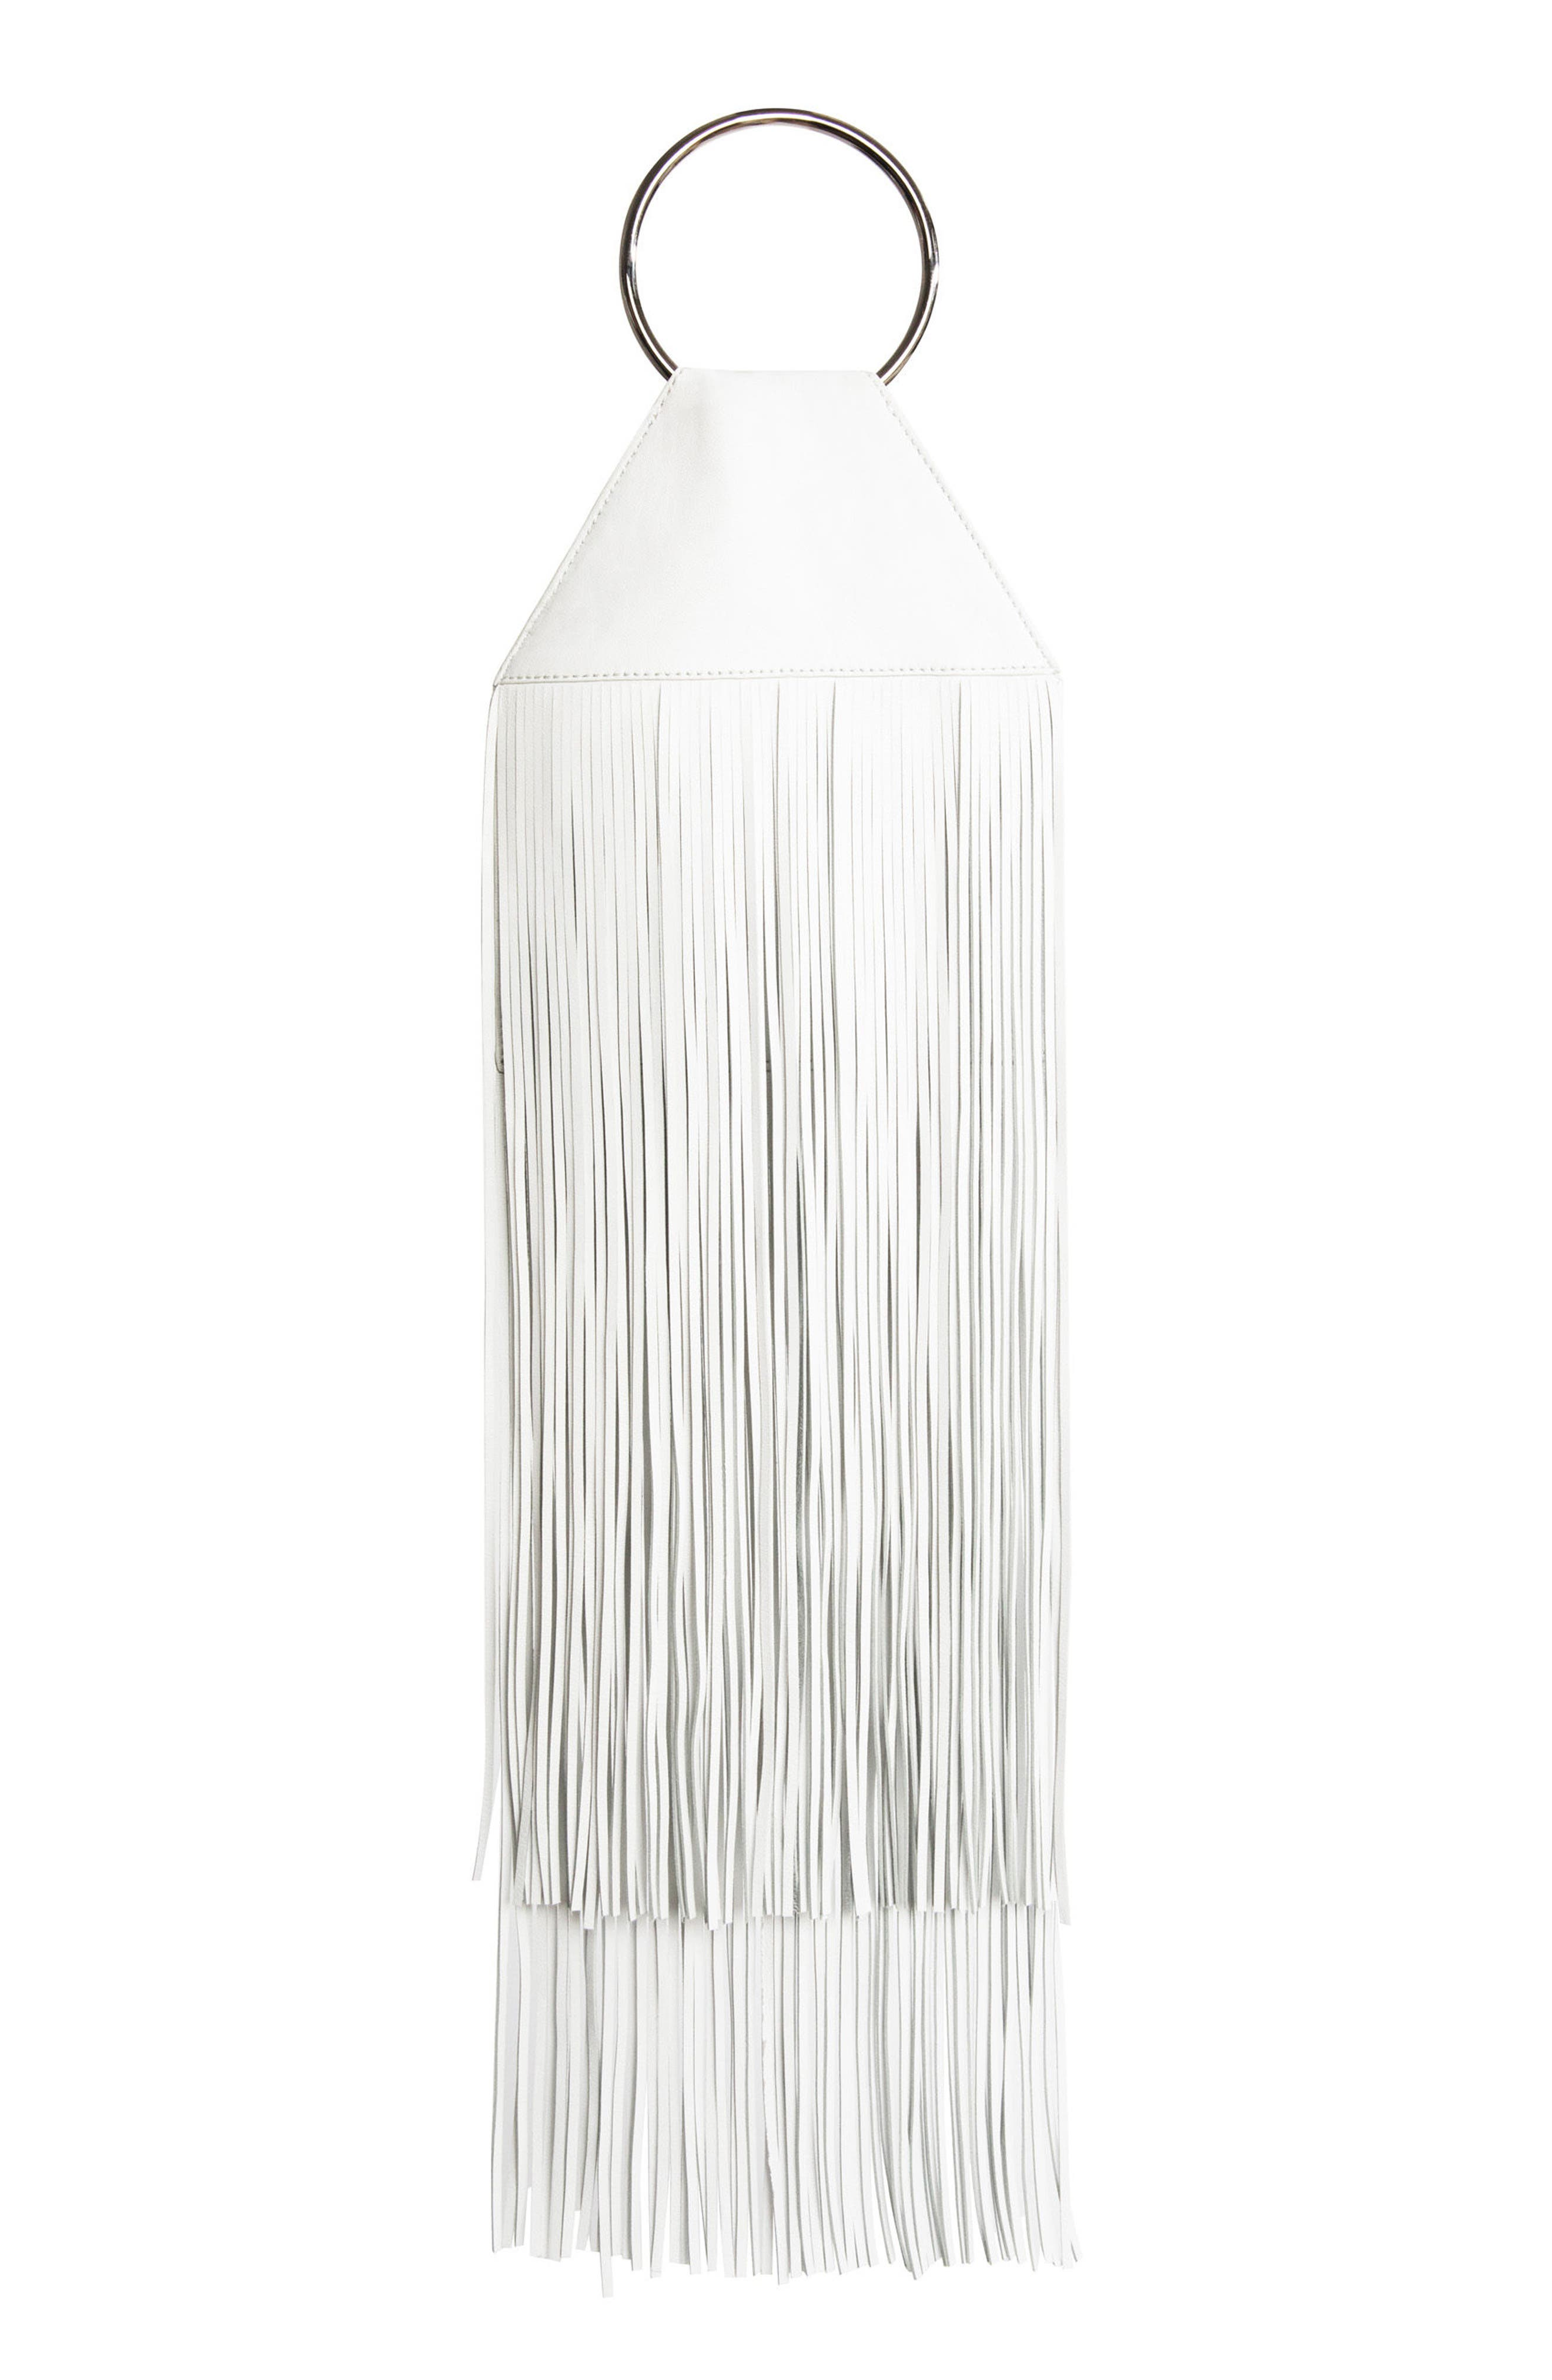 KARA Fringe Lambskin Ring Clutch - Metallic in White/ Silver